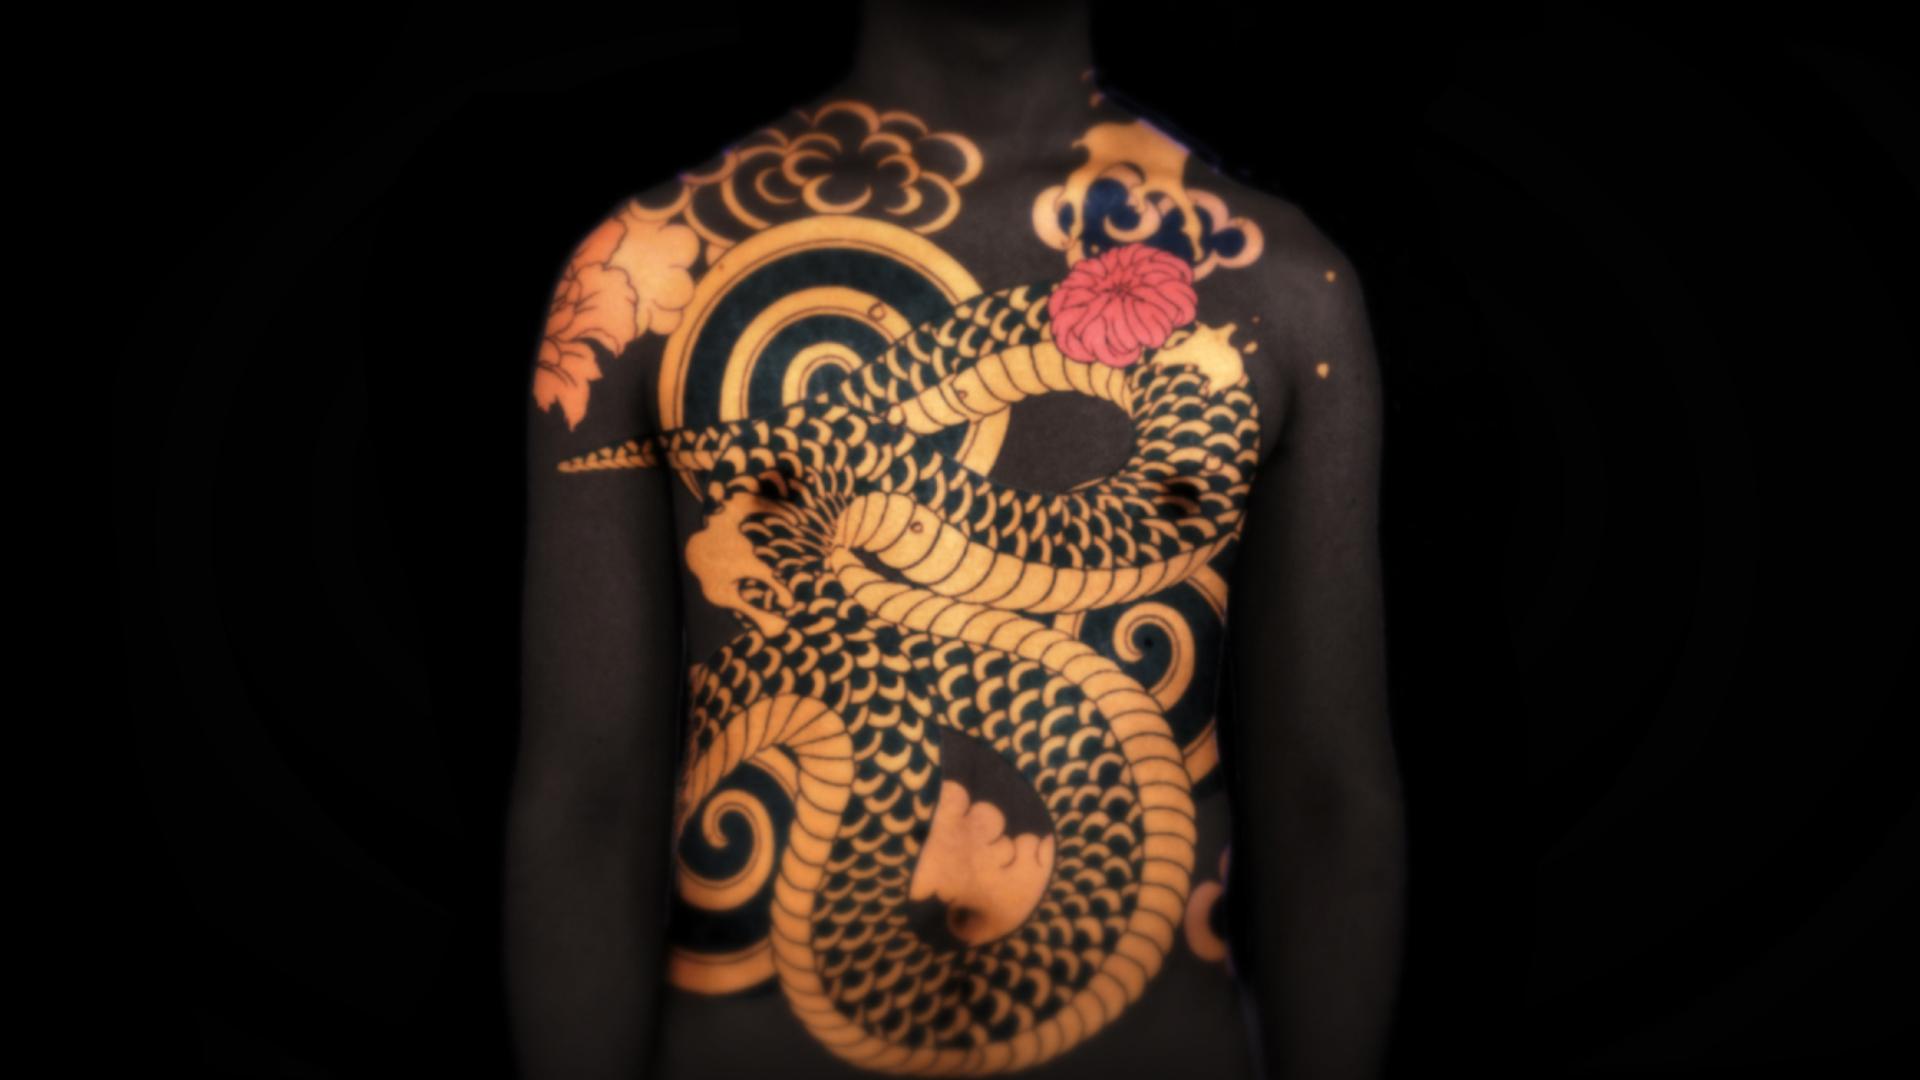 Japanese Tattoo wallpaper 125854 1920x1080